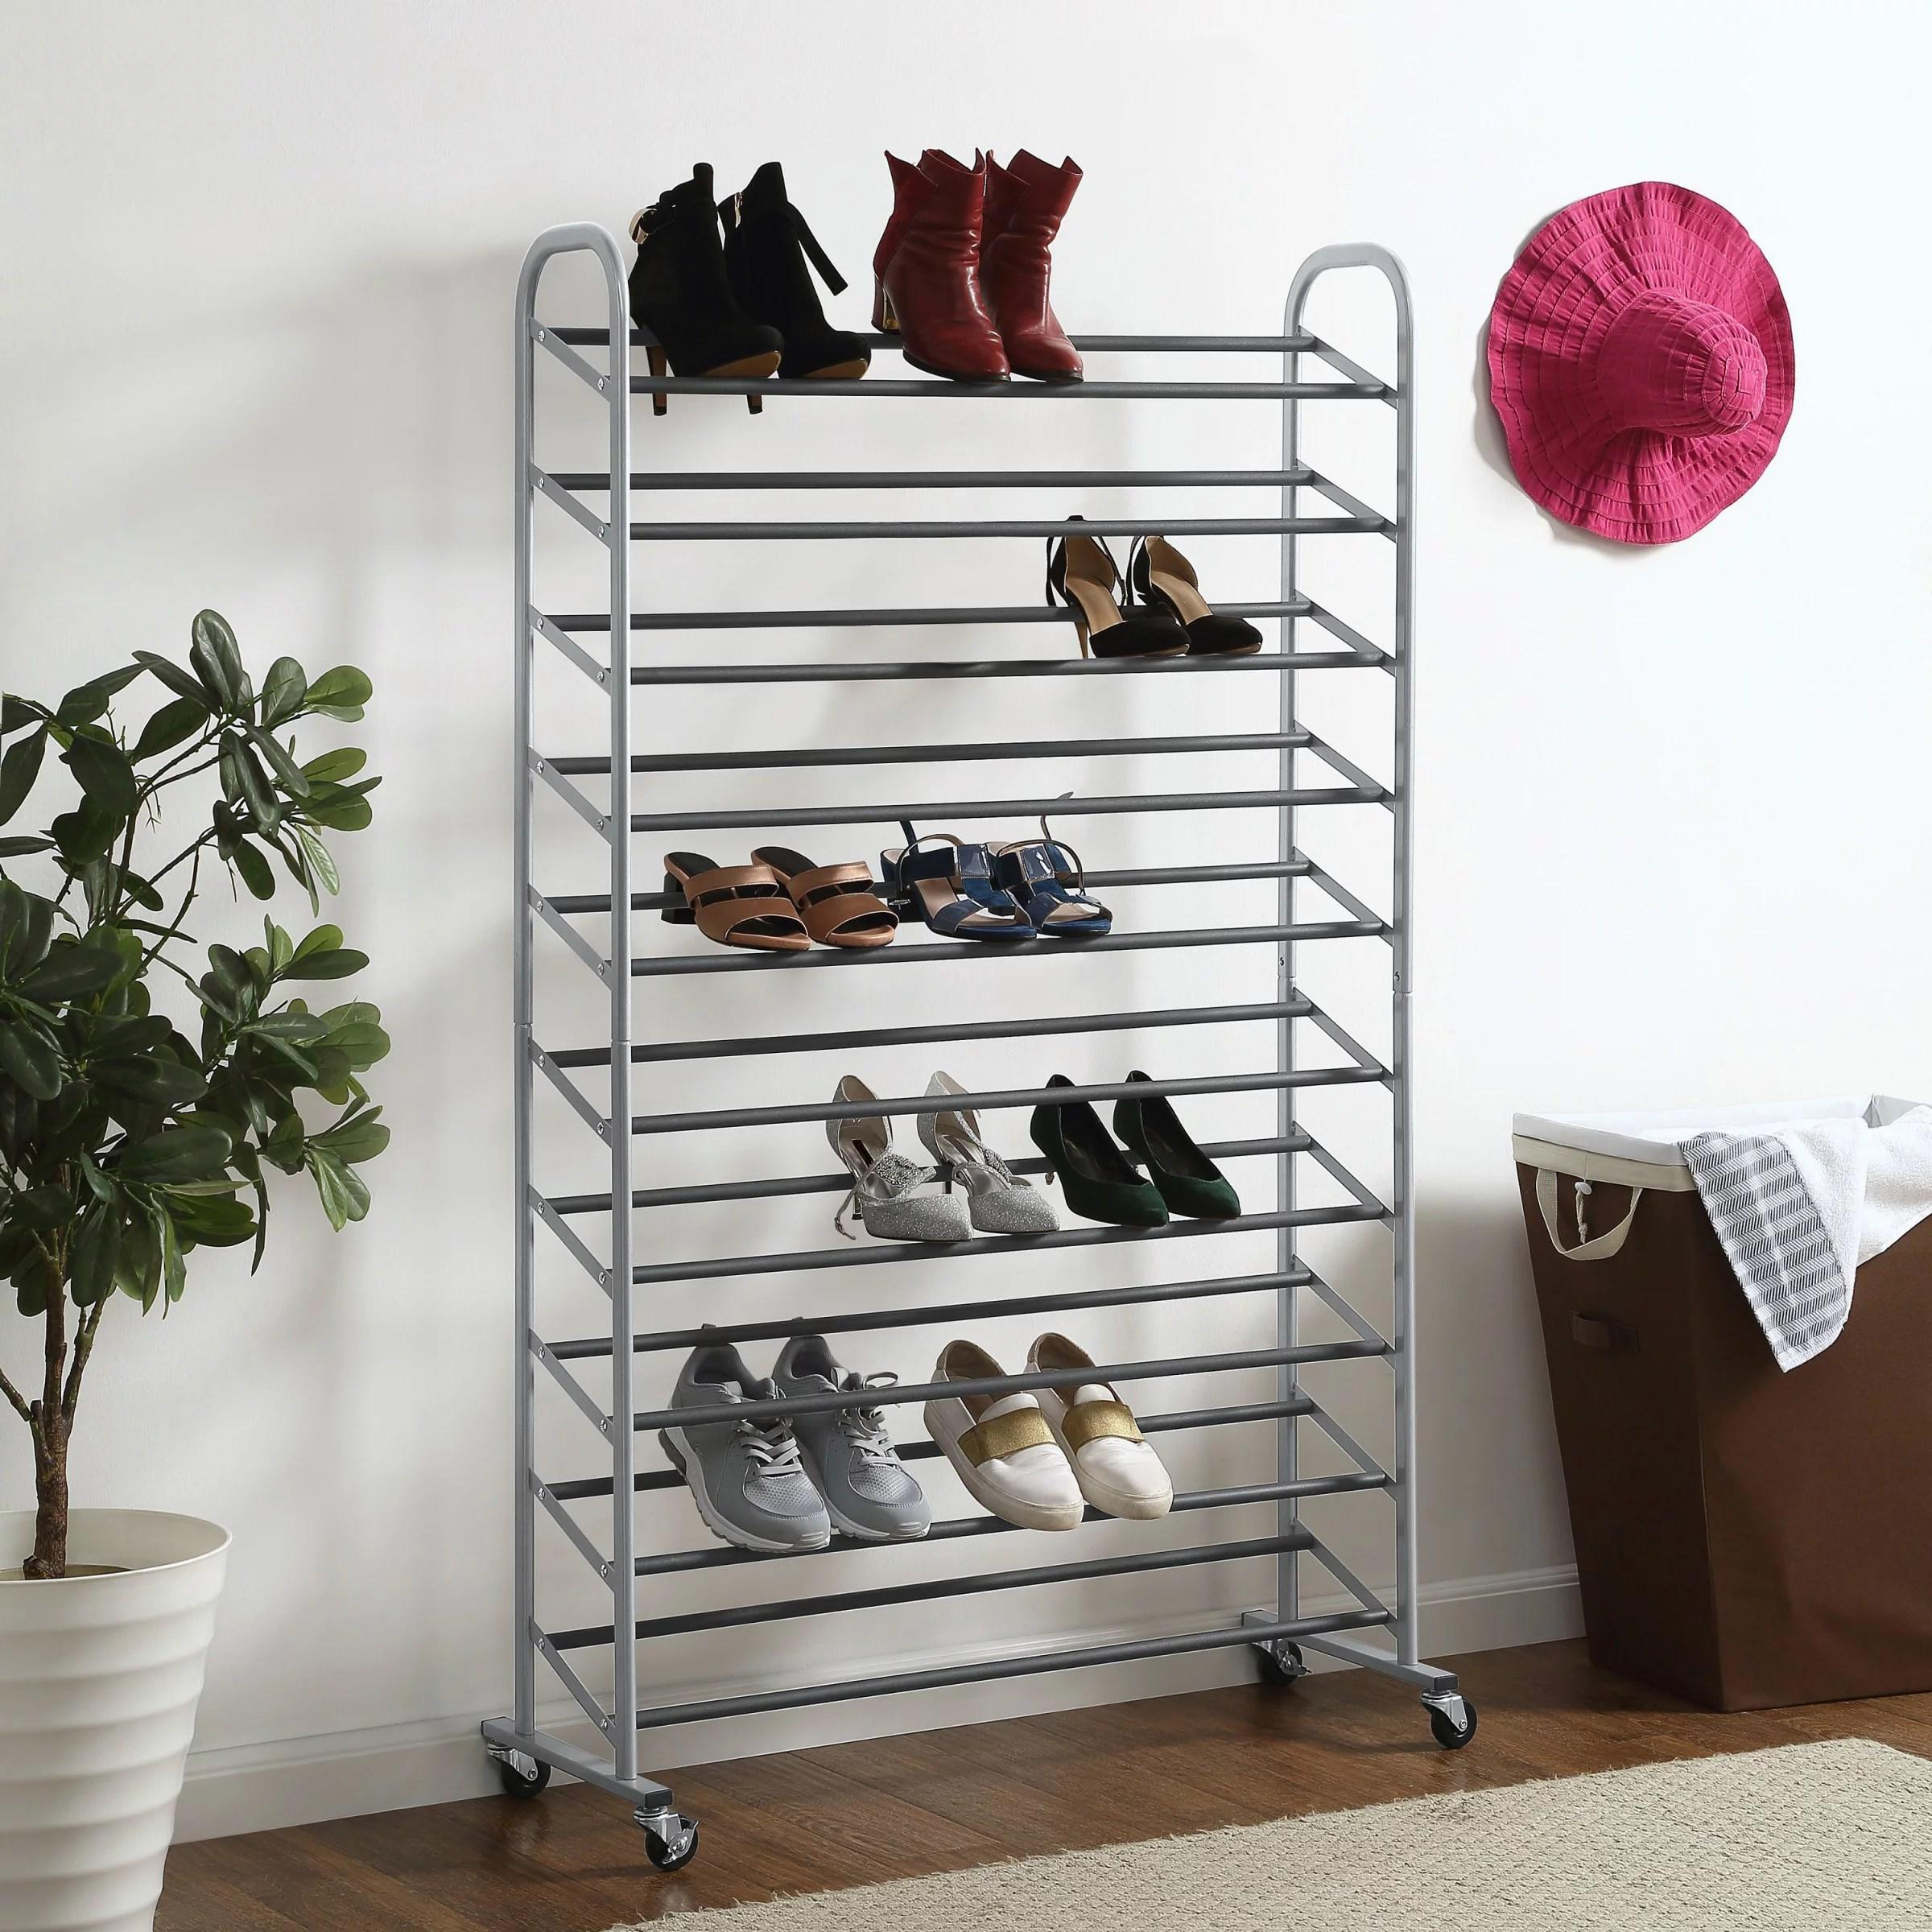 mainstays 10 tier rolling shoe rack versatile design for all shoe types